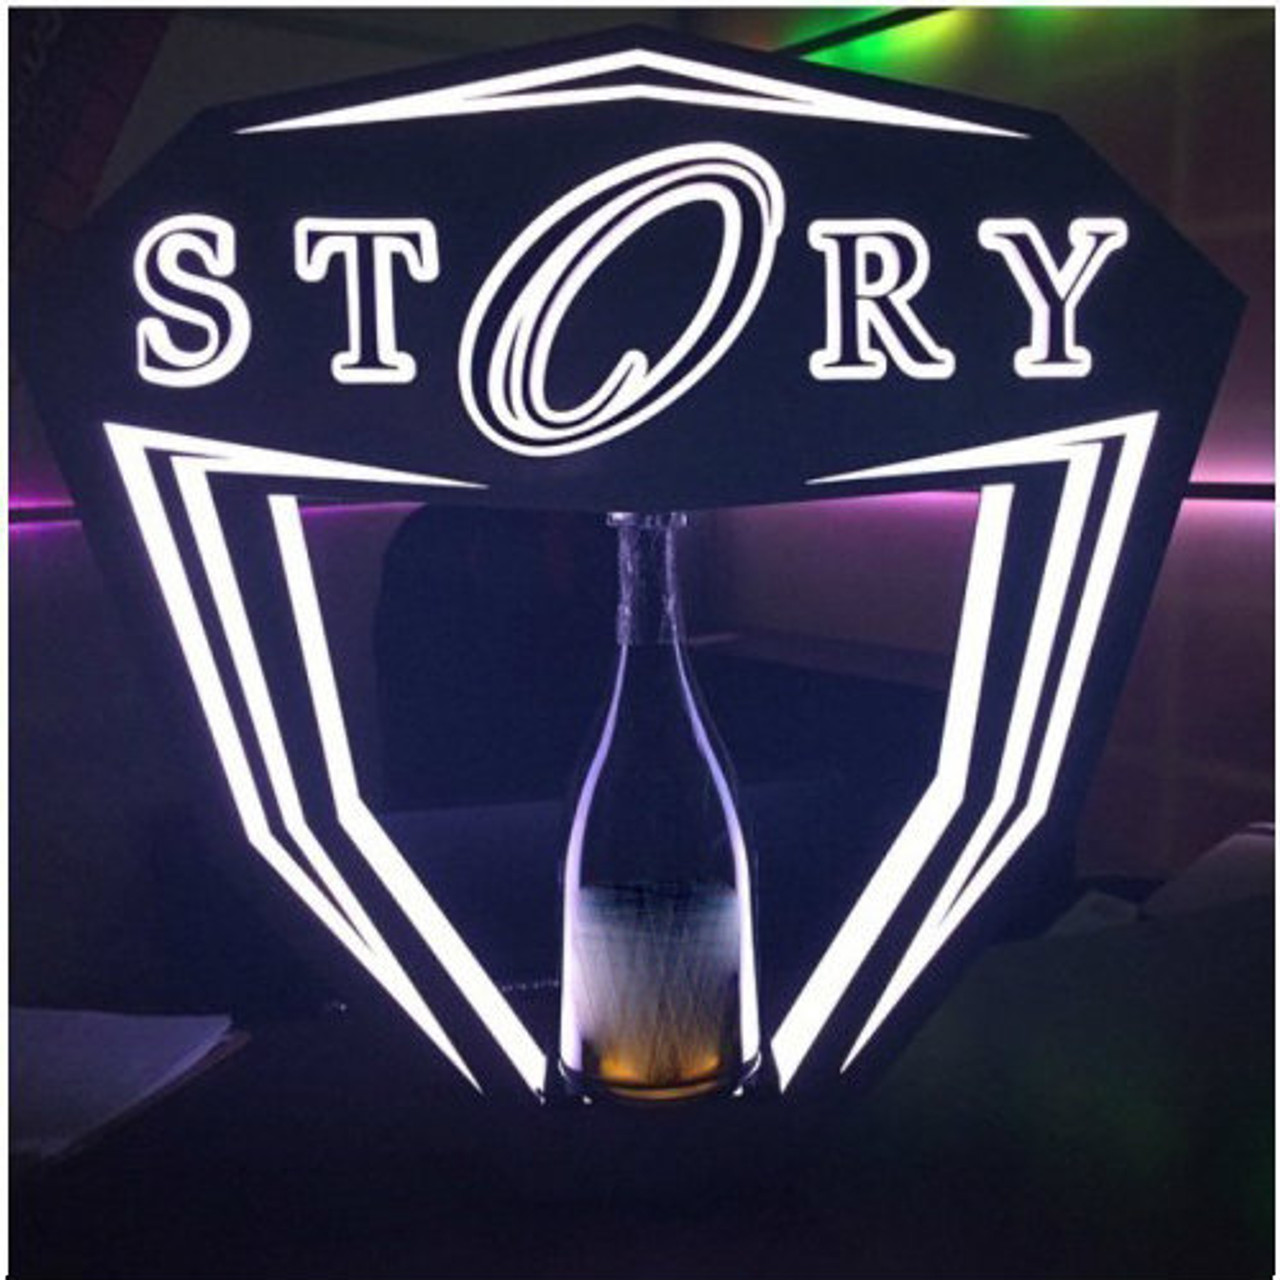 Champagne, 750 ml., Bottle,Service,Delivery,Hypemakerz,presentation, Carrier,holderpresenter,LED,LIV,Tray, Hype,Monthly,Service,Plan,Program,Nightclubshop